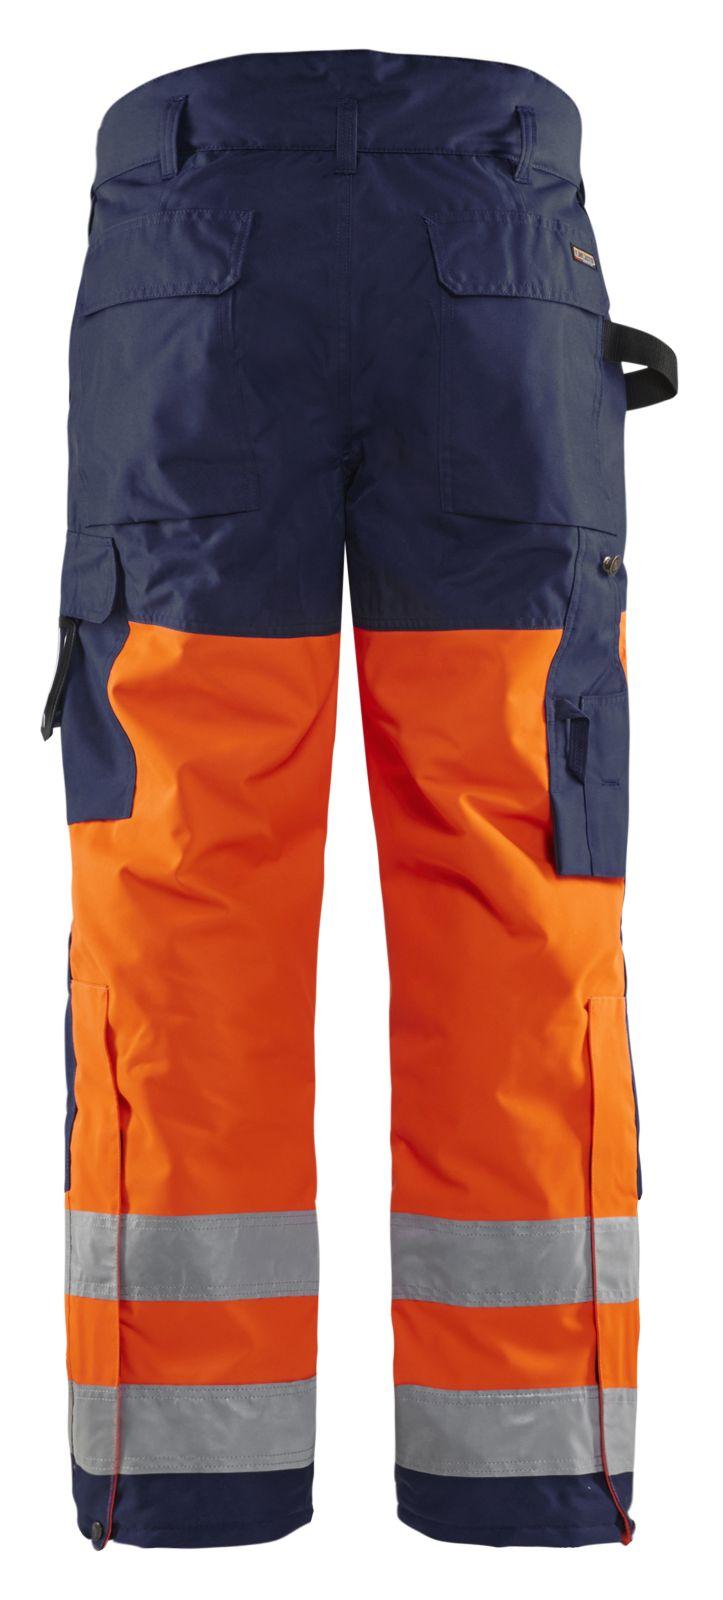 Blaklader Winterbroeken 18831997 High Vis oranje-marineblauw(5389)